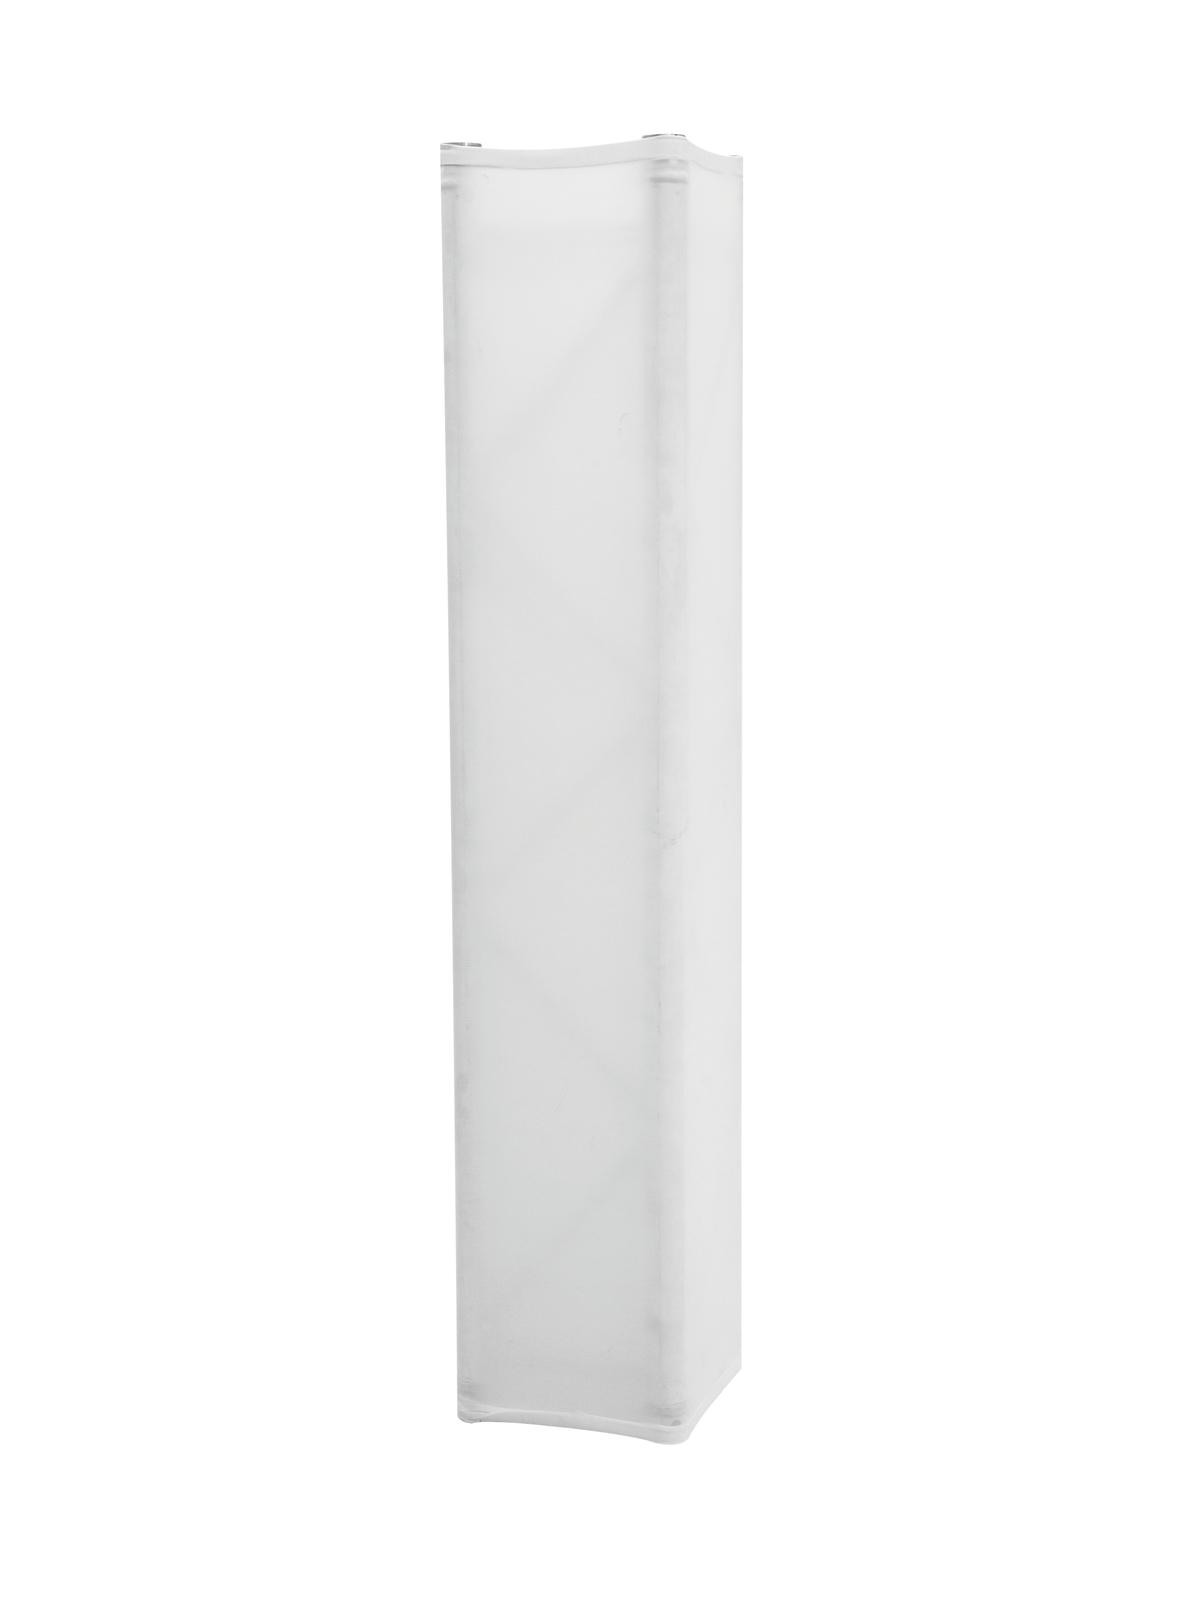 Kryt elastický pro konstrukci 200cm, bílý